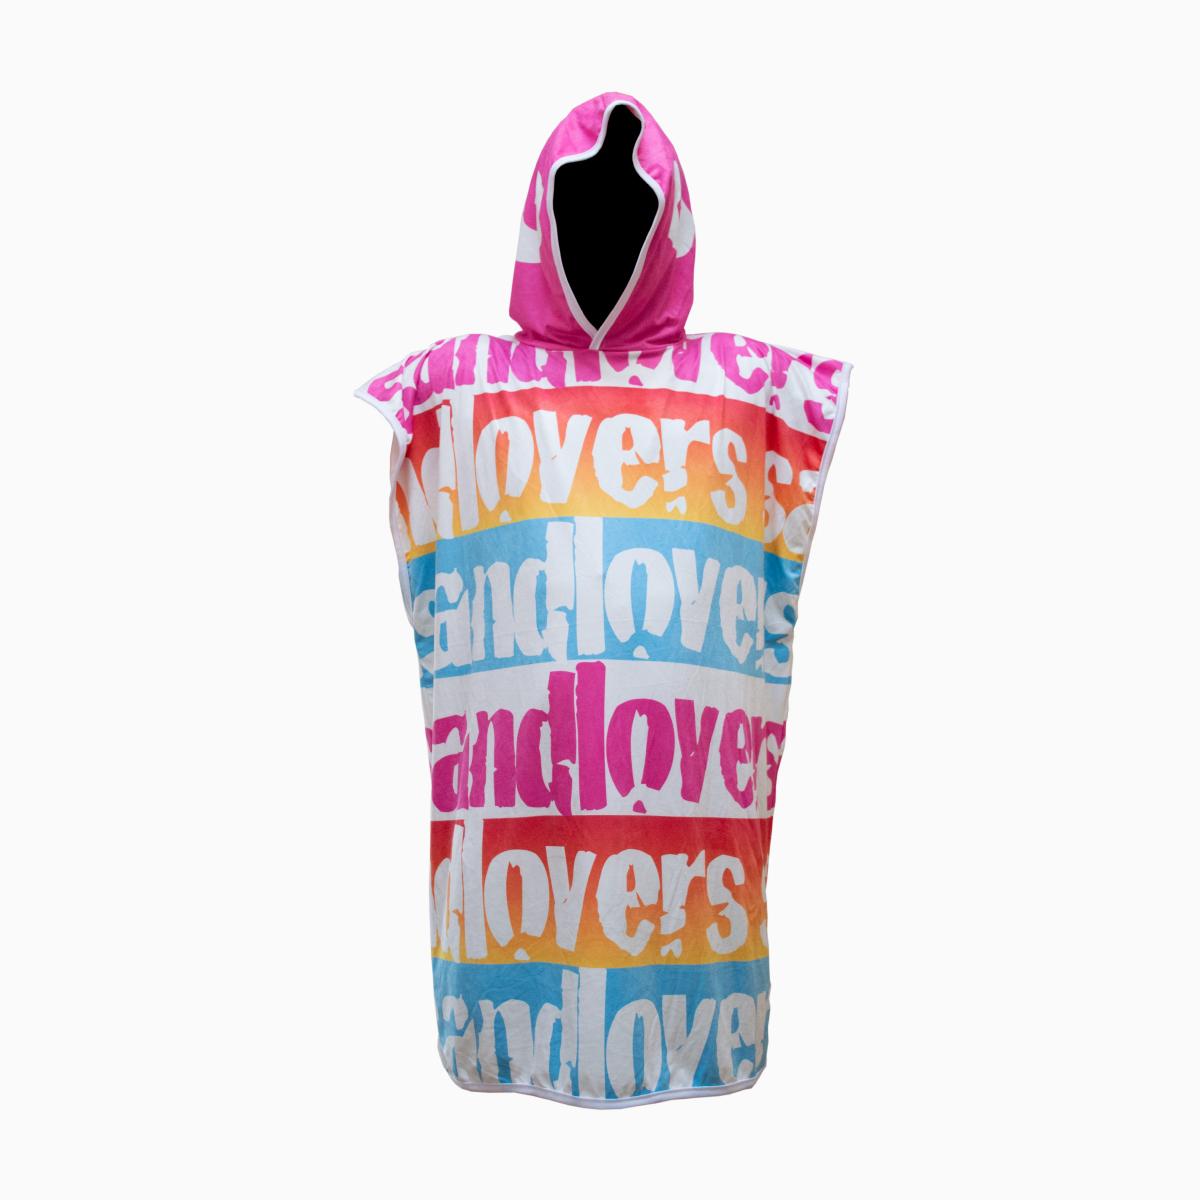 Accappatoio Poncho Sandlovers – PRO